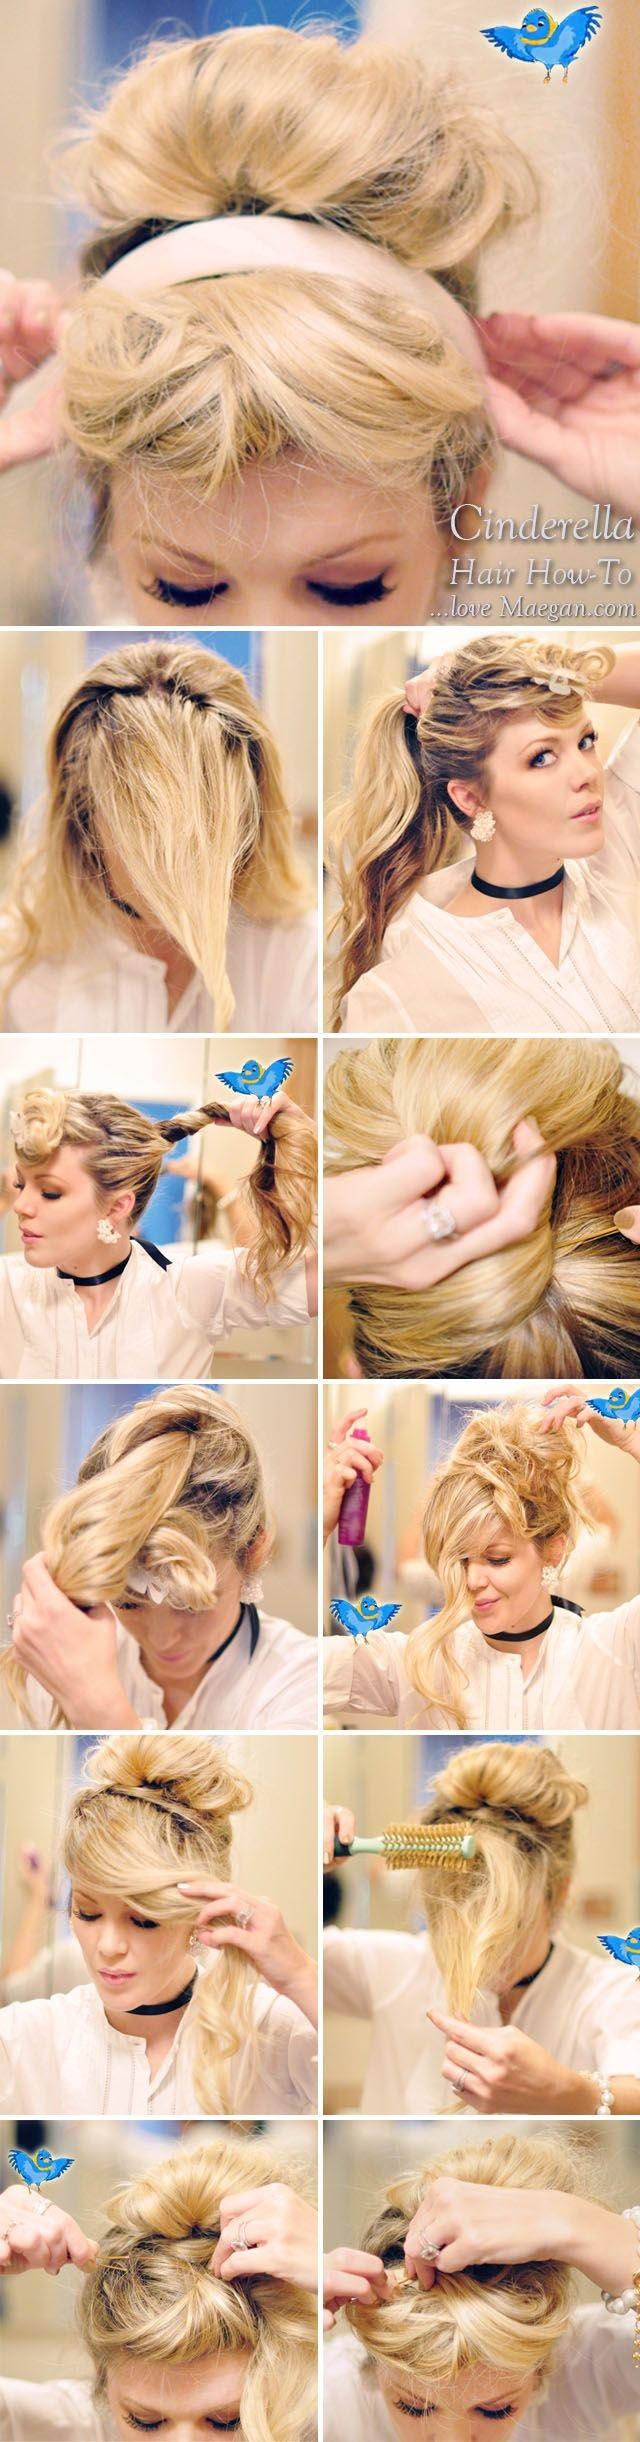 coiffure-soirée-8